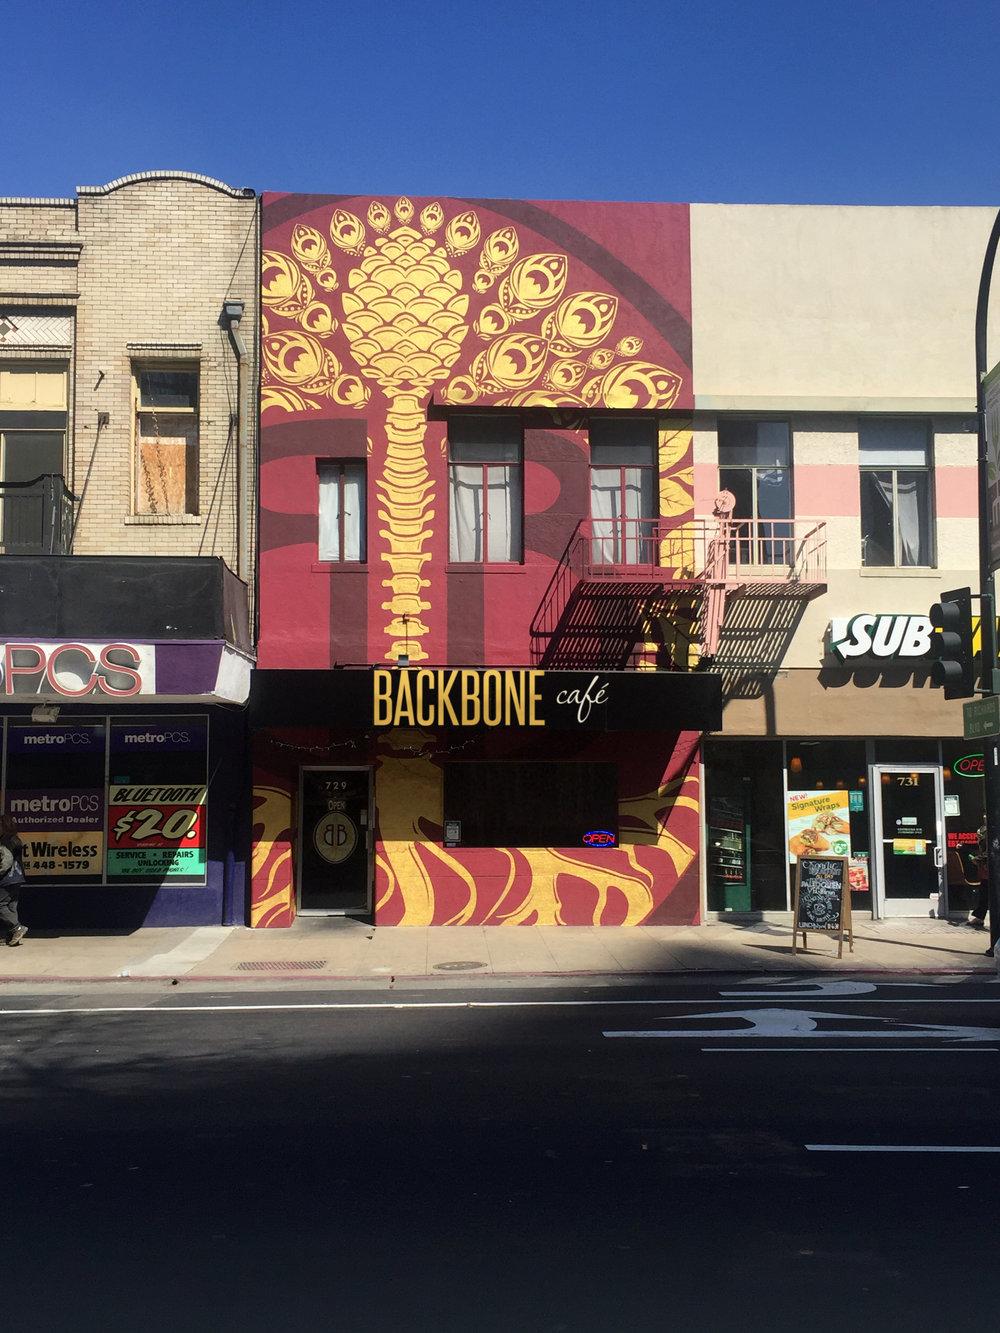 Backbone Cafe - 729 J St. Sacramento, CA 95814